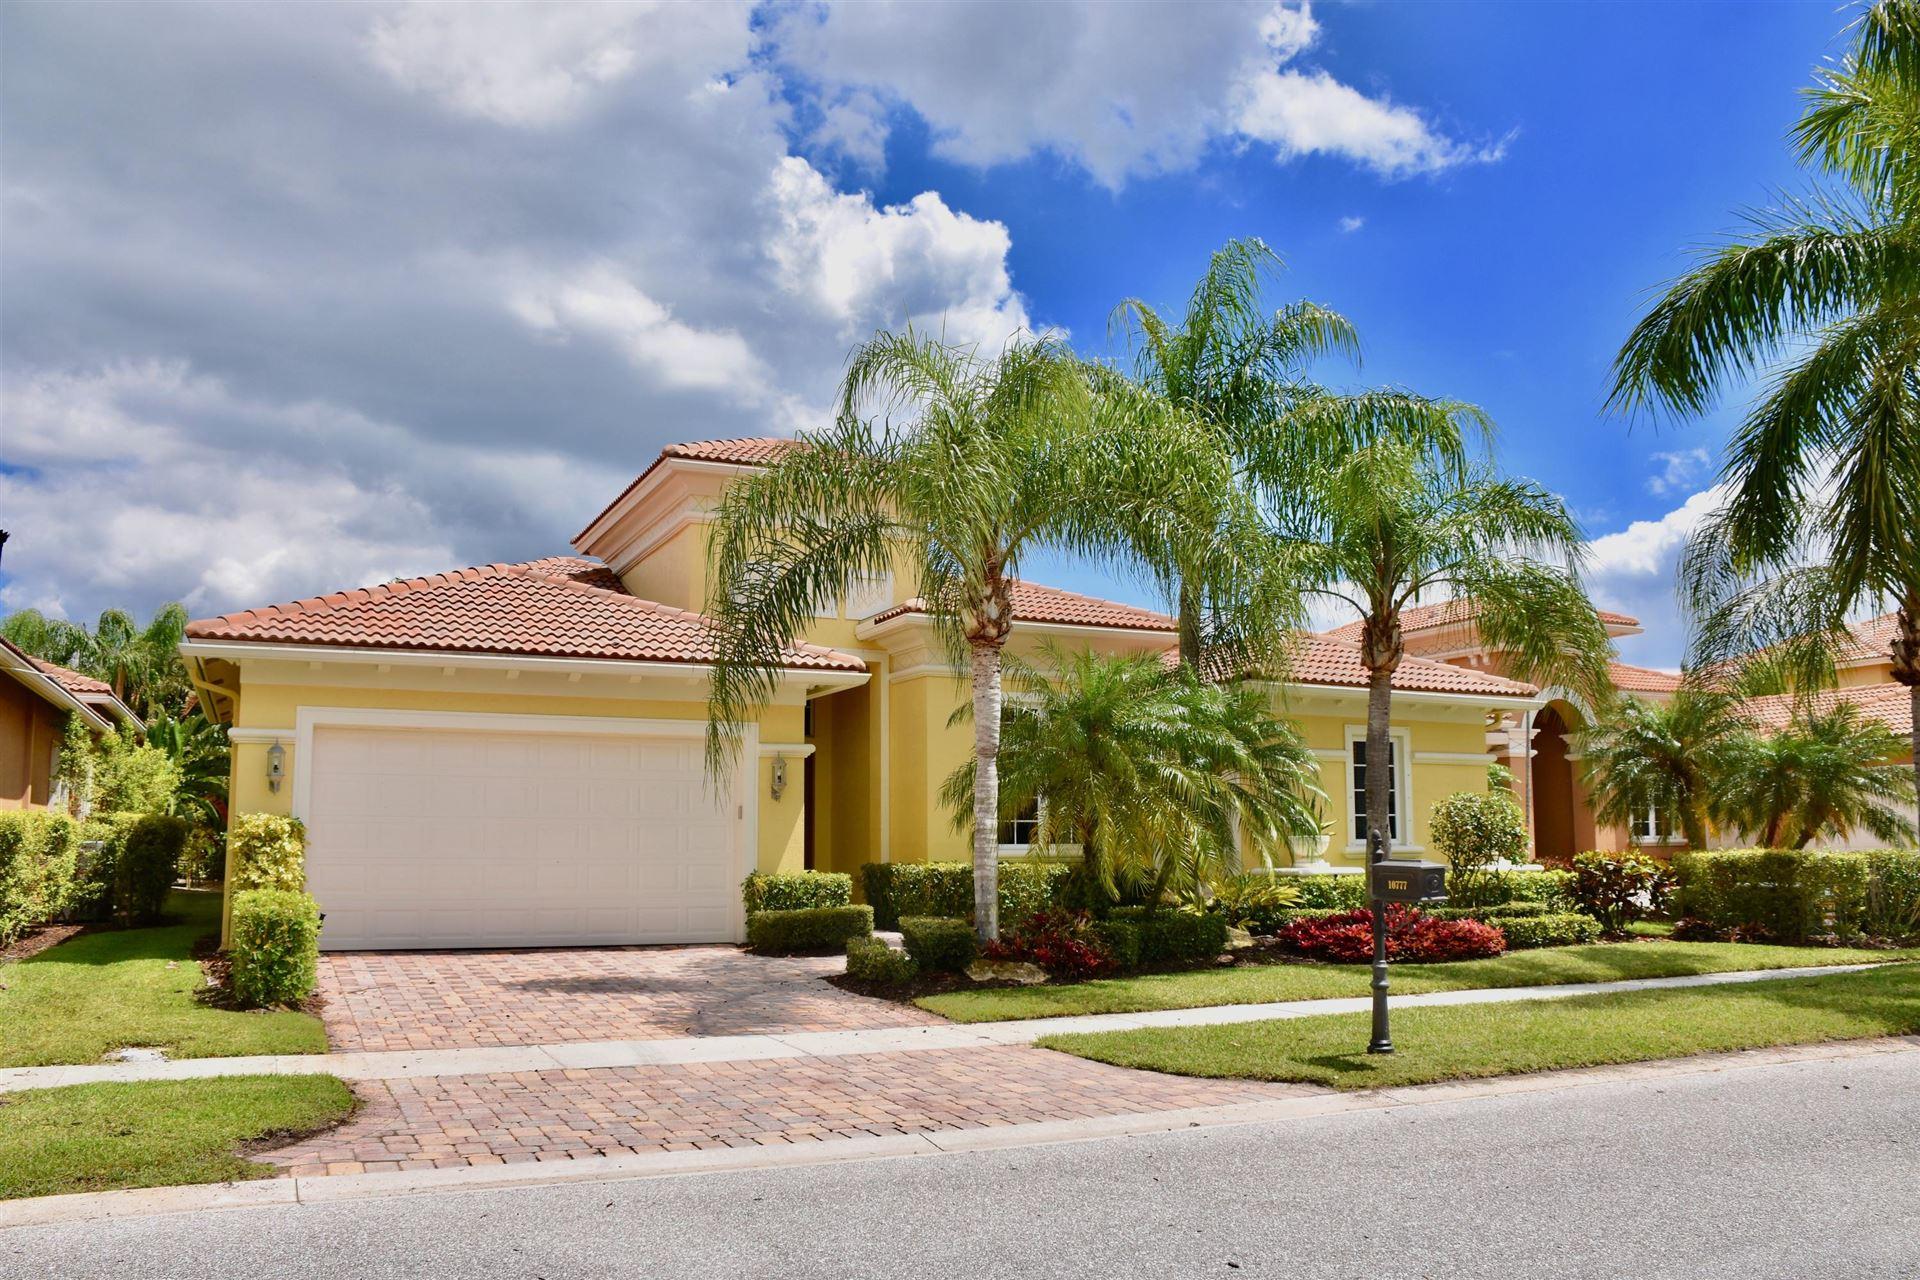 10777 Hollow Bay Terrace, West Palm Beach, FL 33412 - #: RX-10624868